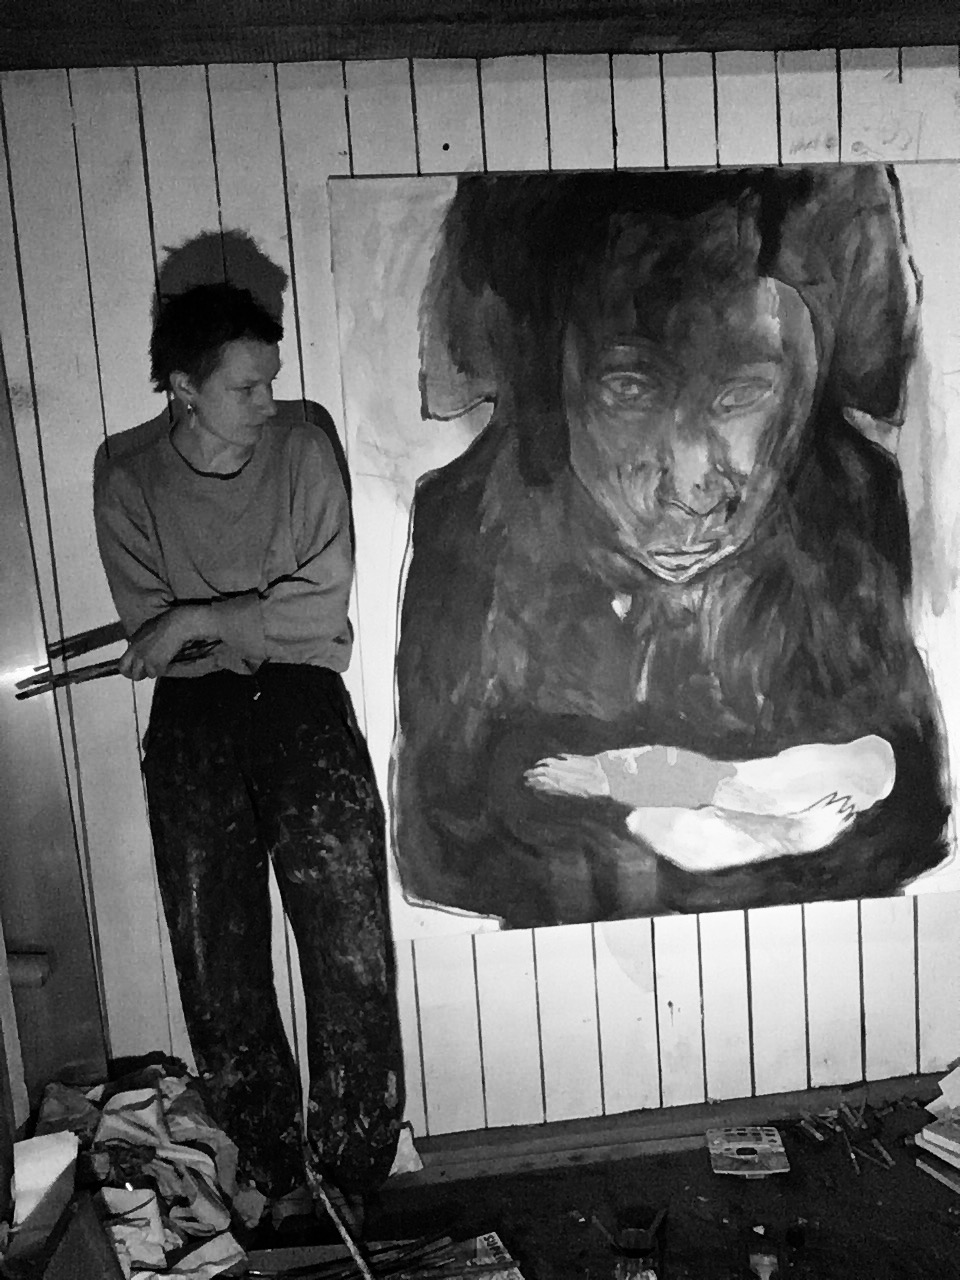 zeigt Jeanne Jacob neben gemahltem Selbstportrait